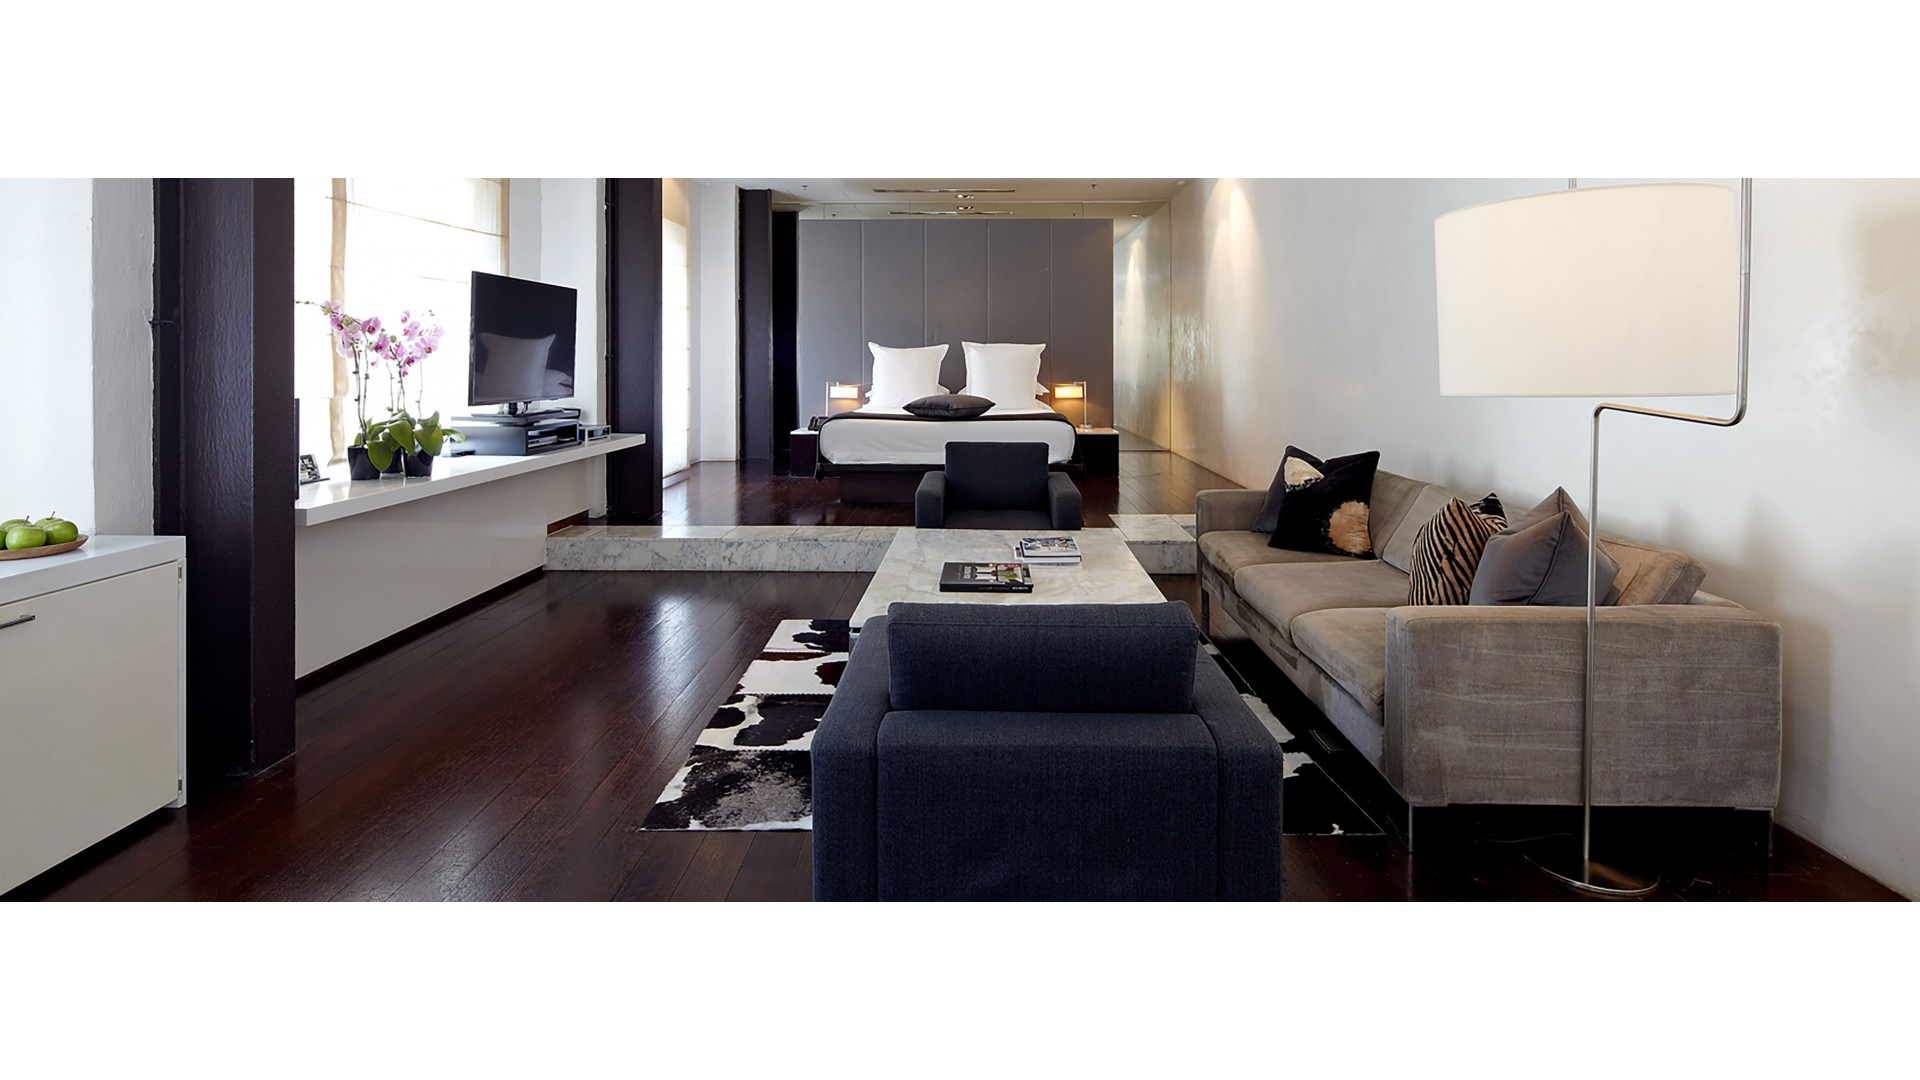 Establishment Hotel Cbd Sydney New South Wales Smith Hotels